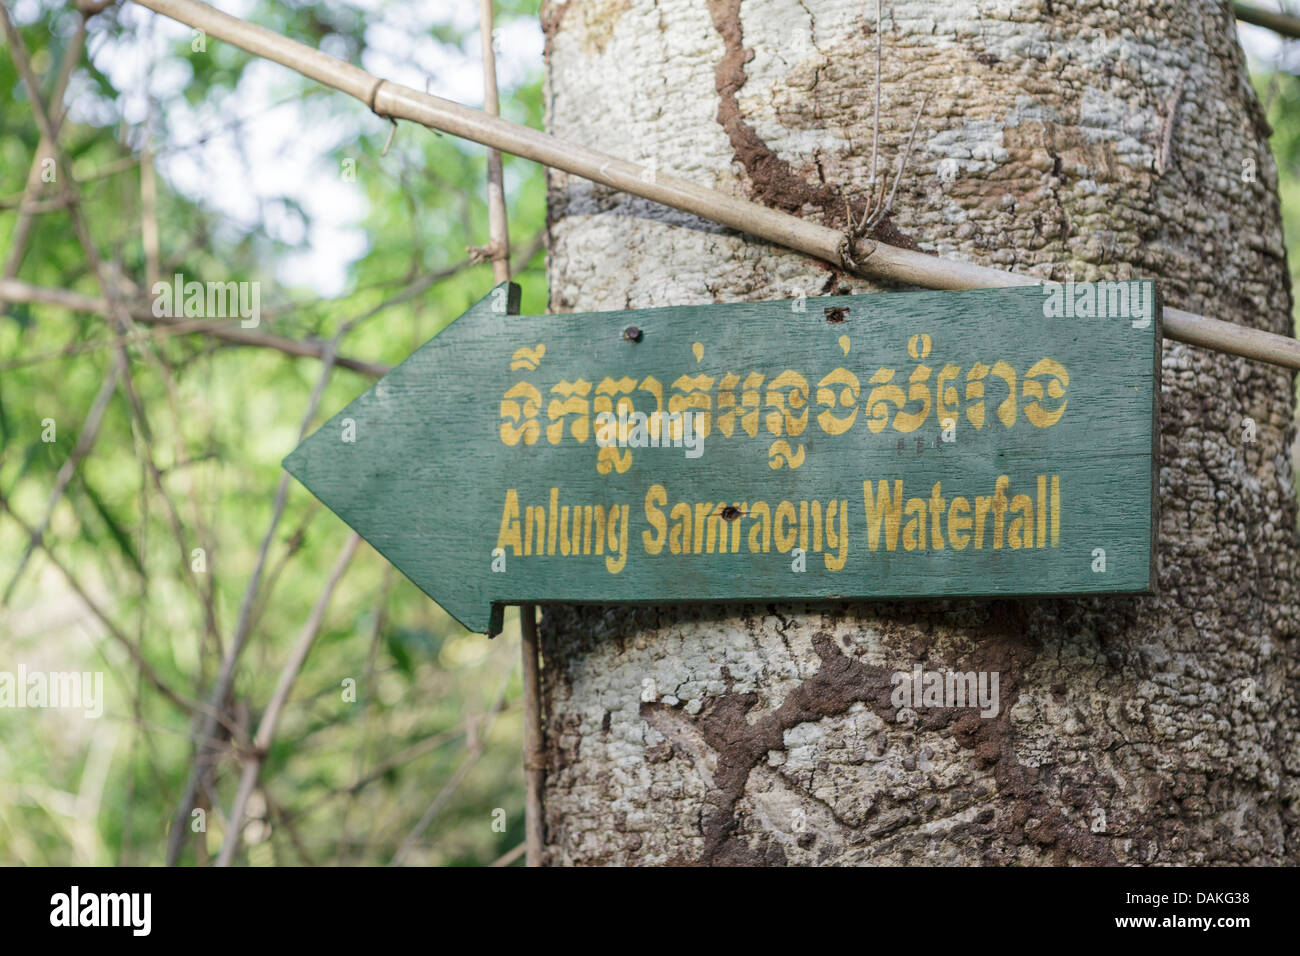 Sign to Anlung Samraong Waterfall, Chambok Ecotourism Park, Vietnma, South East Asia. - Stock Image